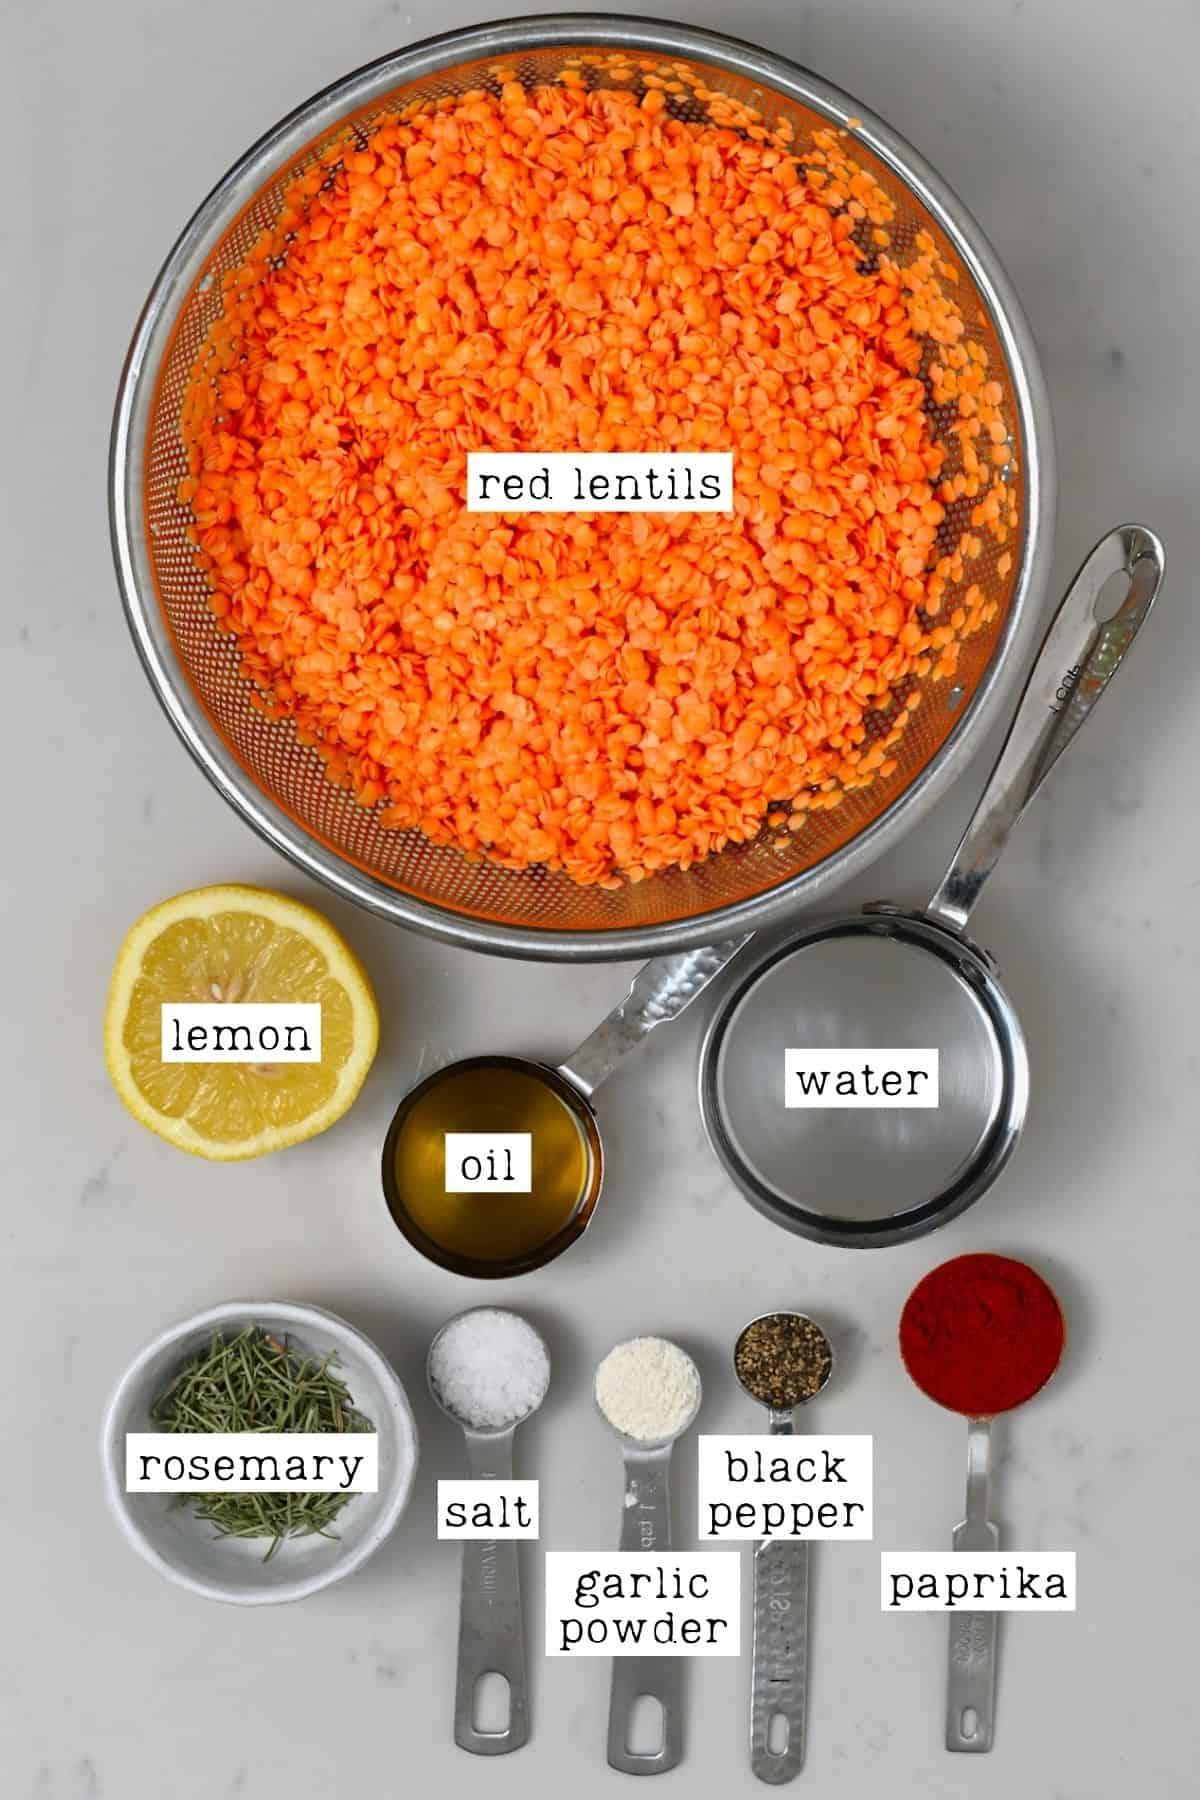 Ingredients for red lentil crackers